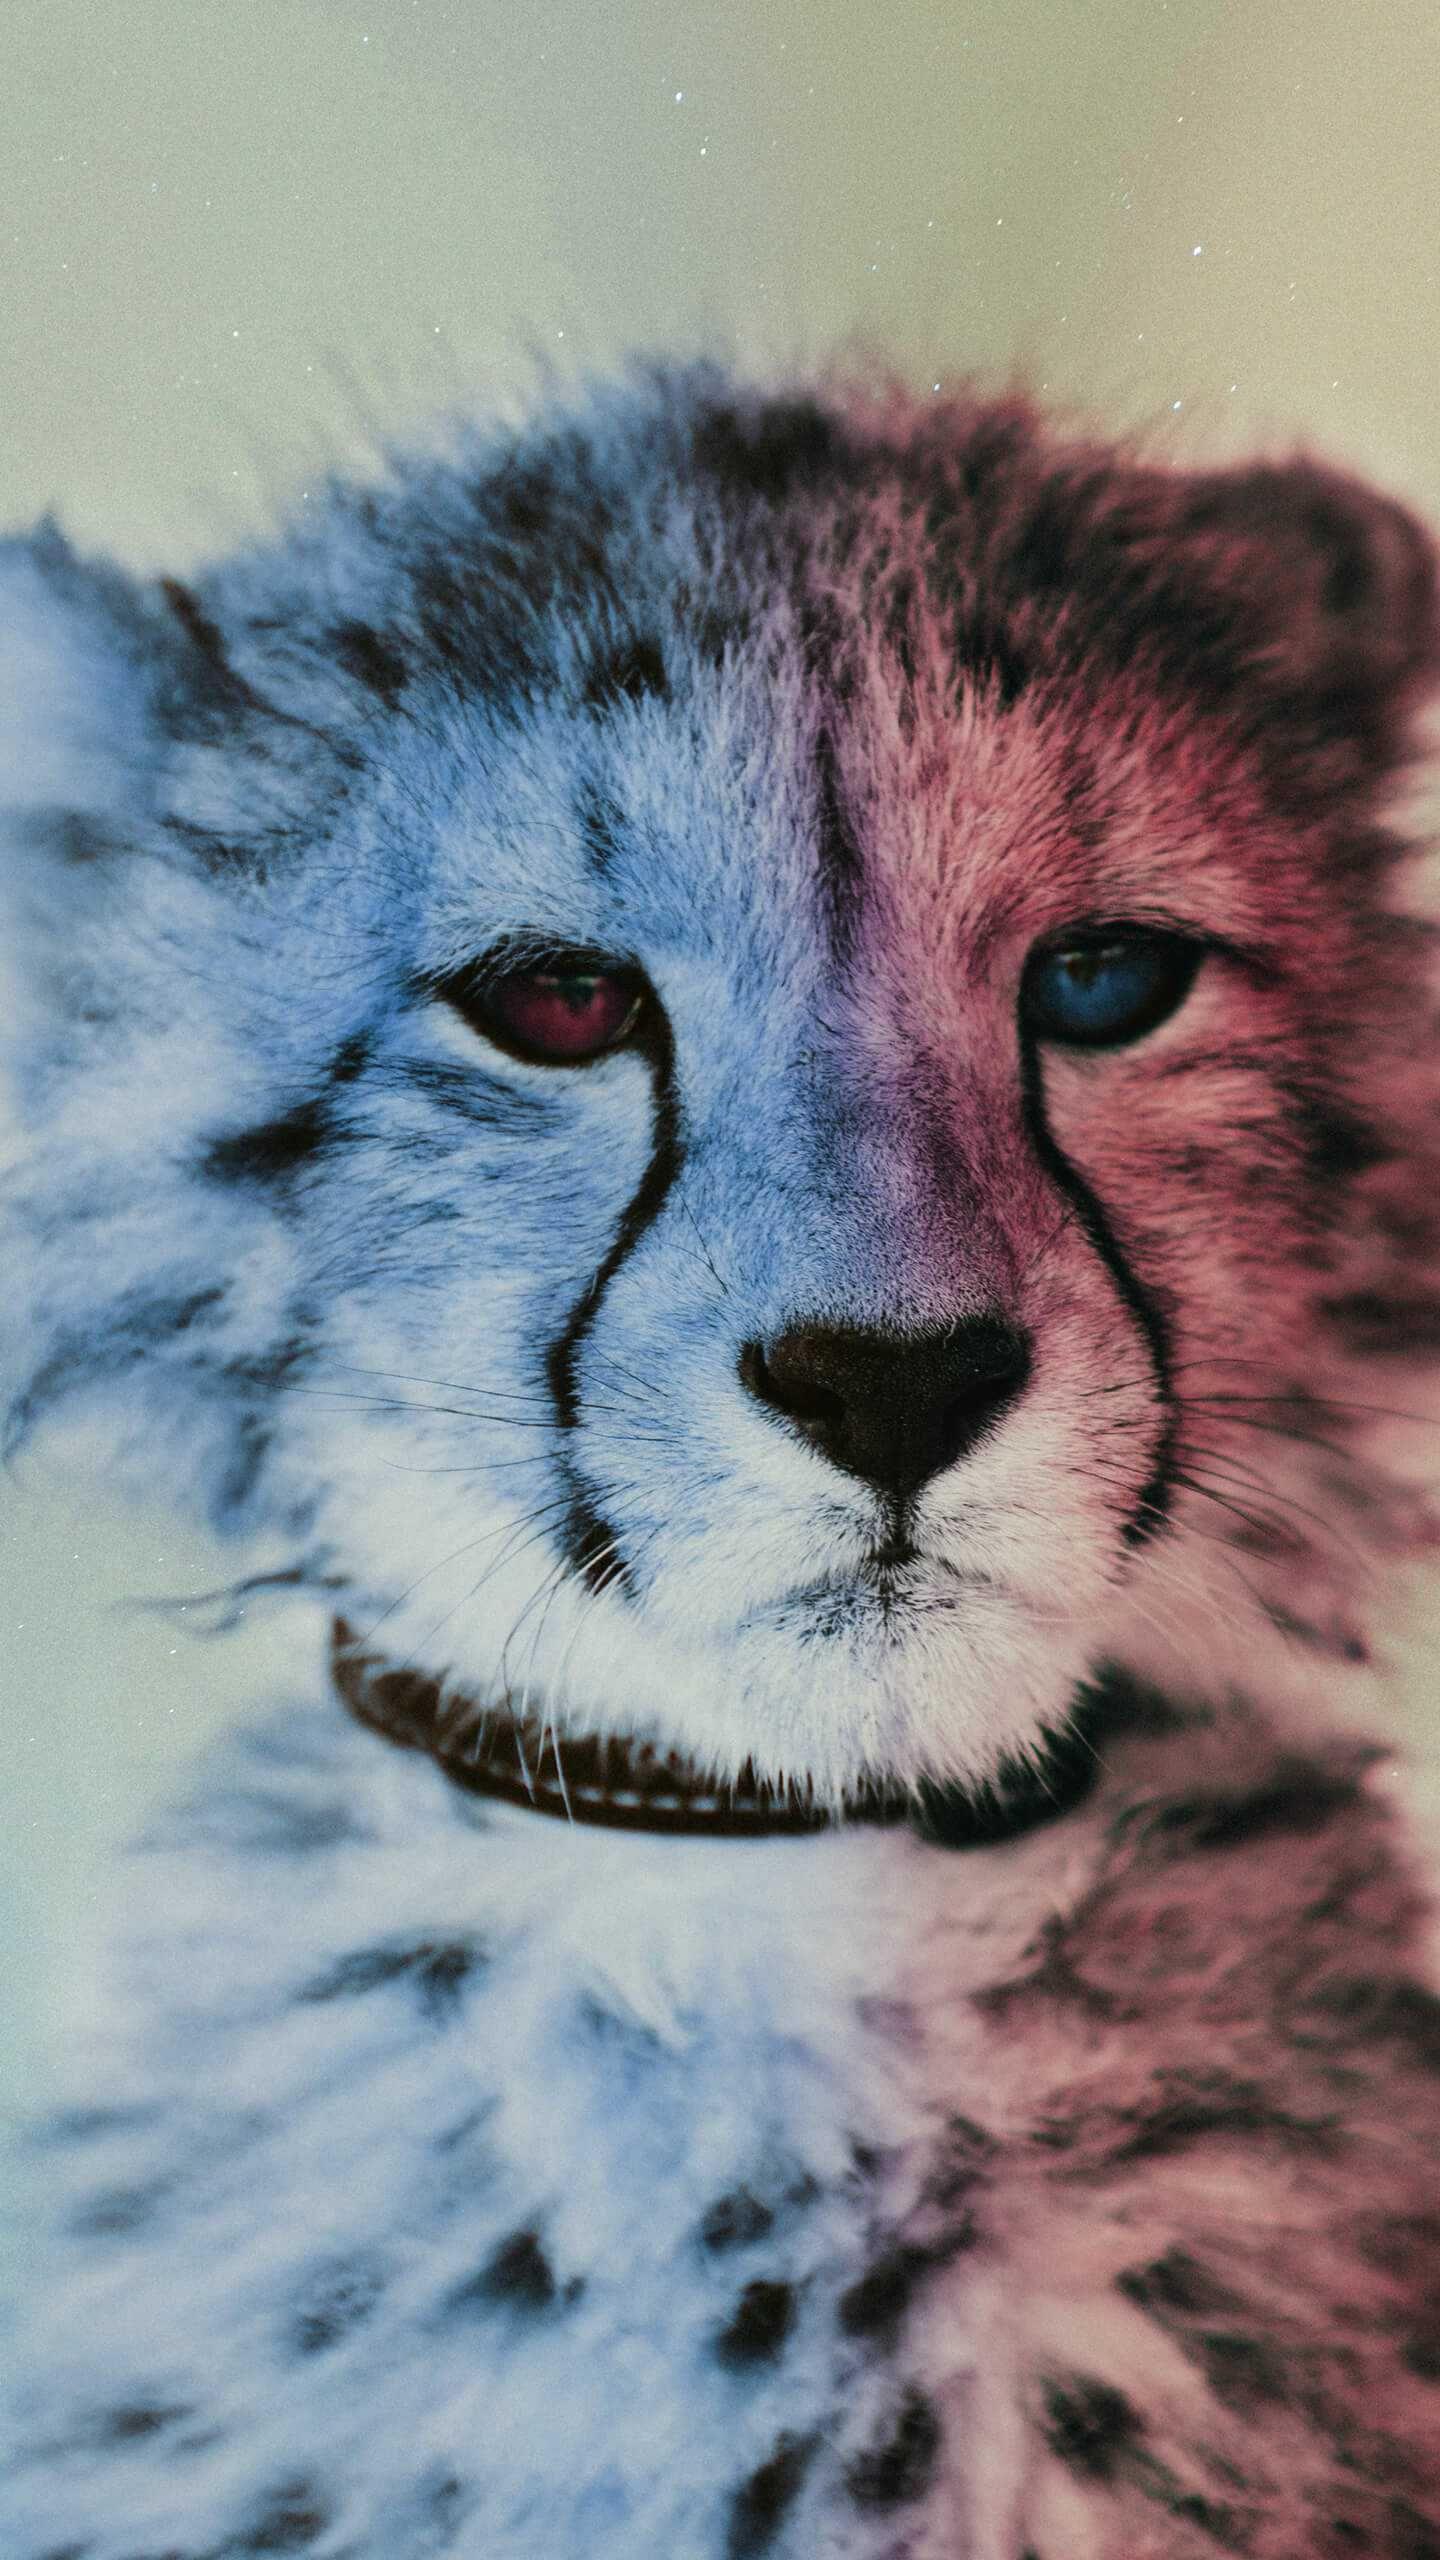 Baby Cheetah Iphone Wallpaper Animal Wallpaper Cheetah Wallpaper Snowman Wallpaper